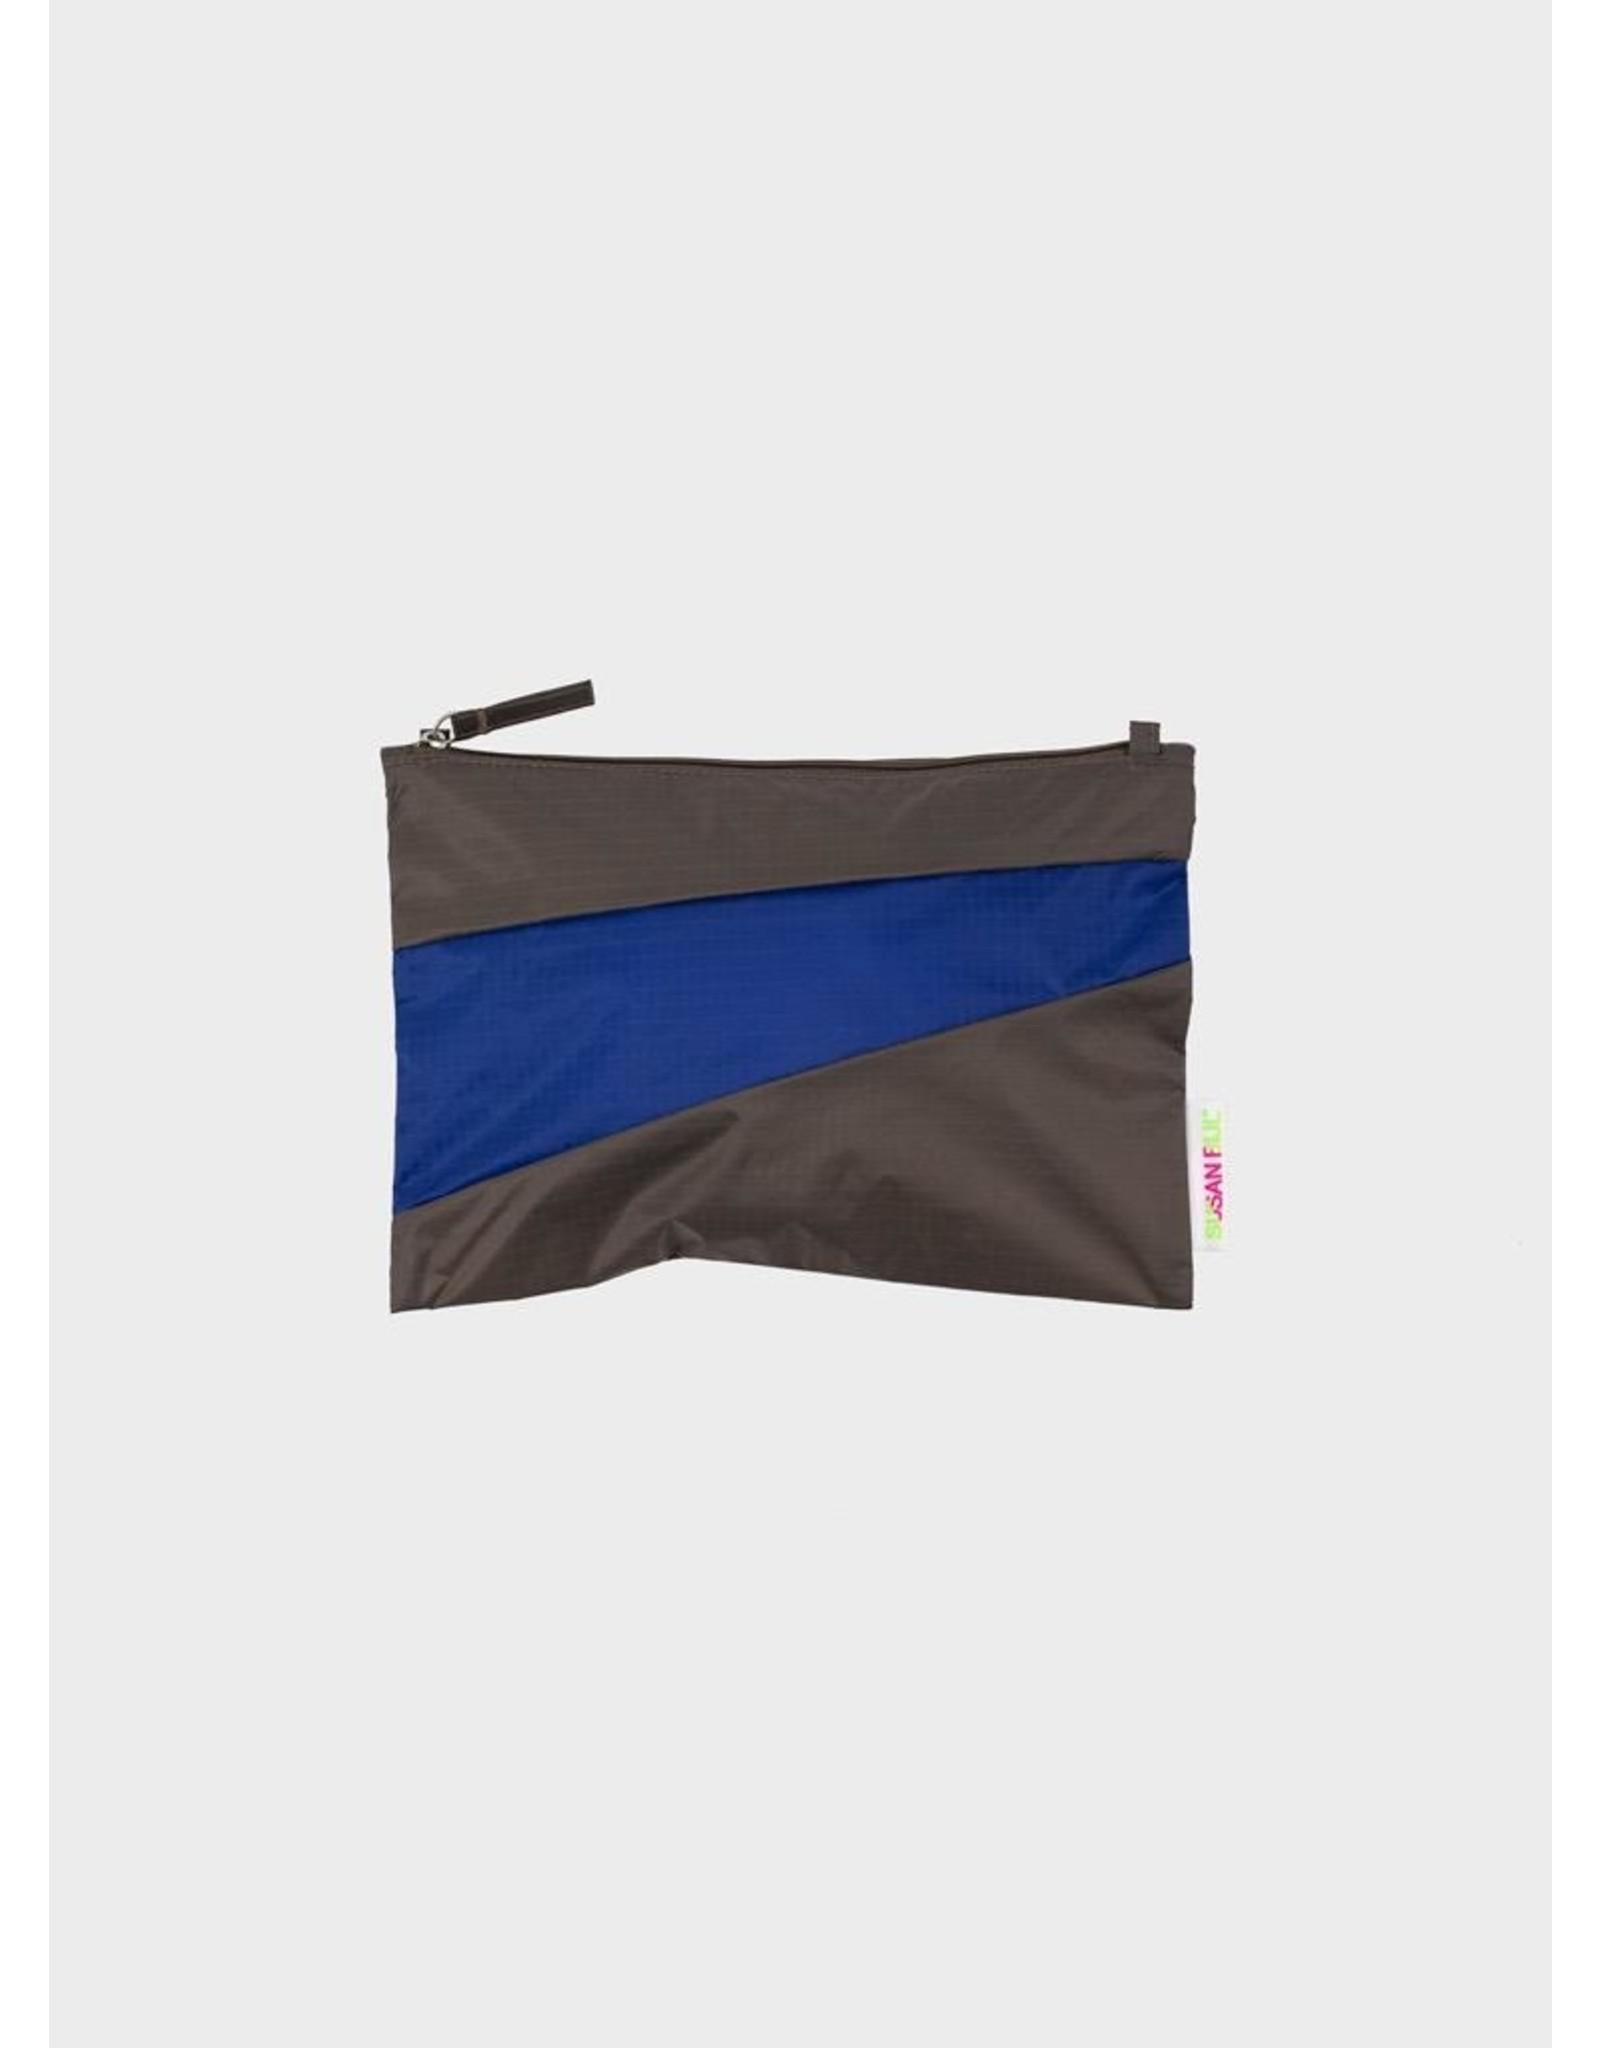 Susan Bijl Pouch M, Warm grey & Electric blue   19 x 29cm